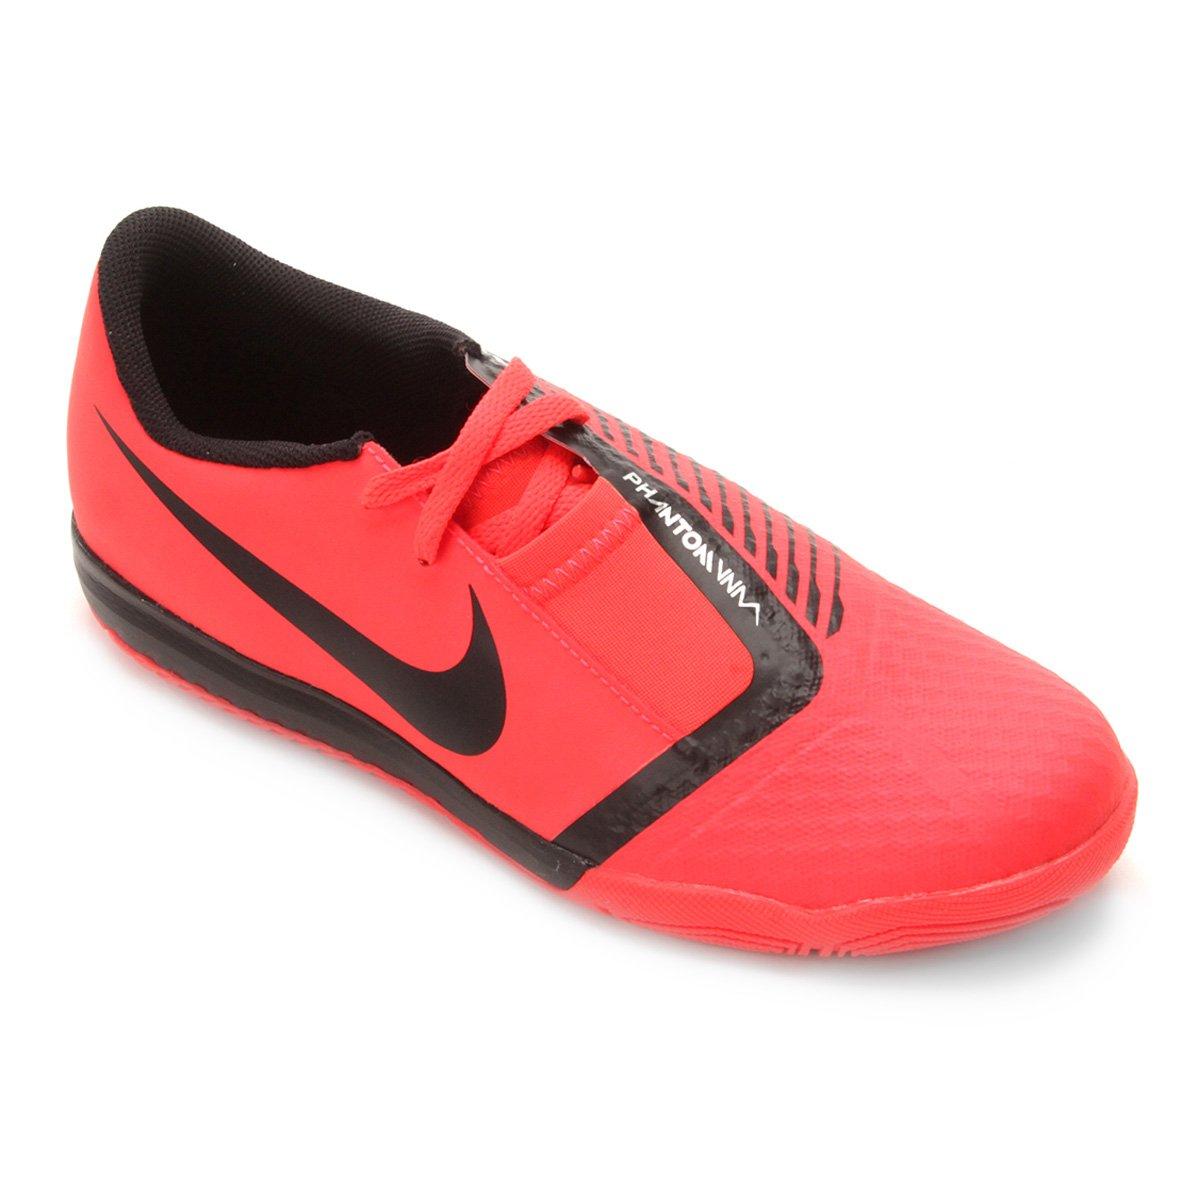 bd88ab6fe68 38%OFF Chuteira Futsal Infantil Nike Phantom Venom Academy IC